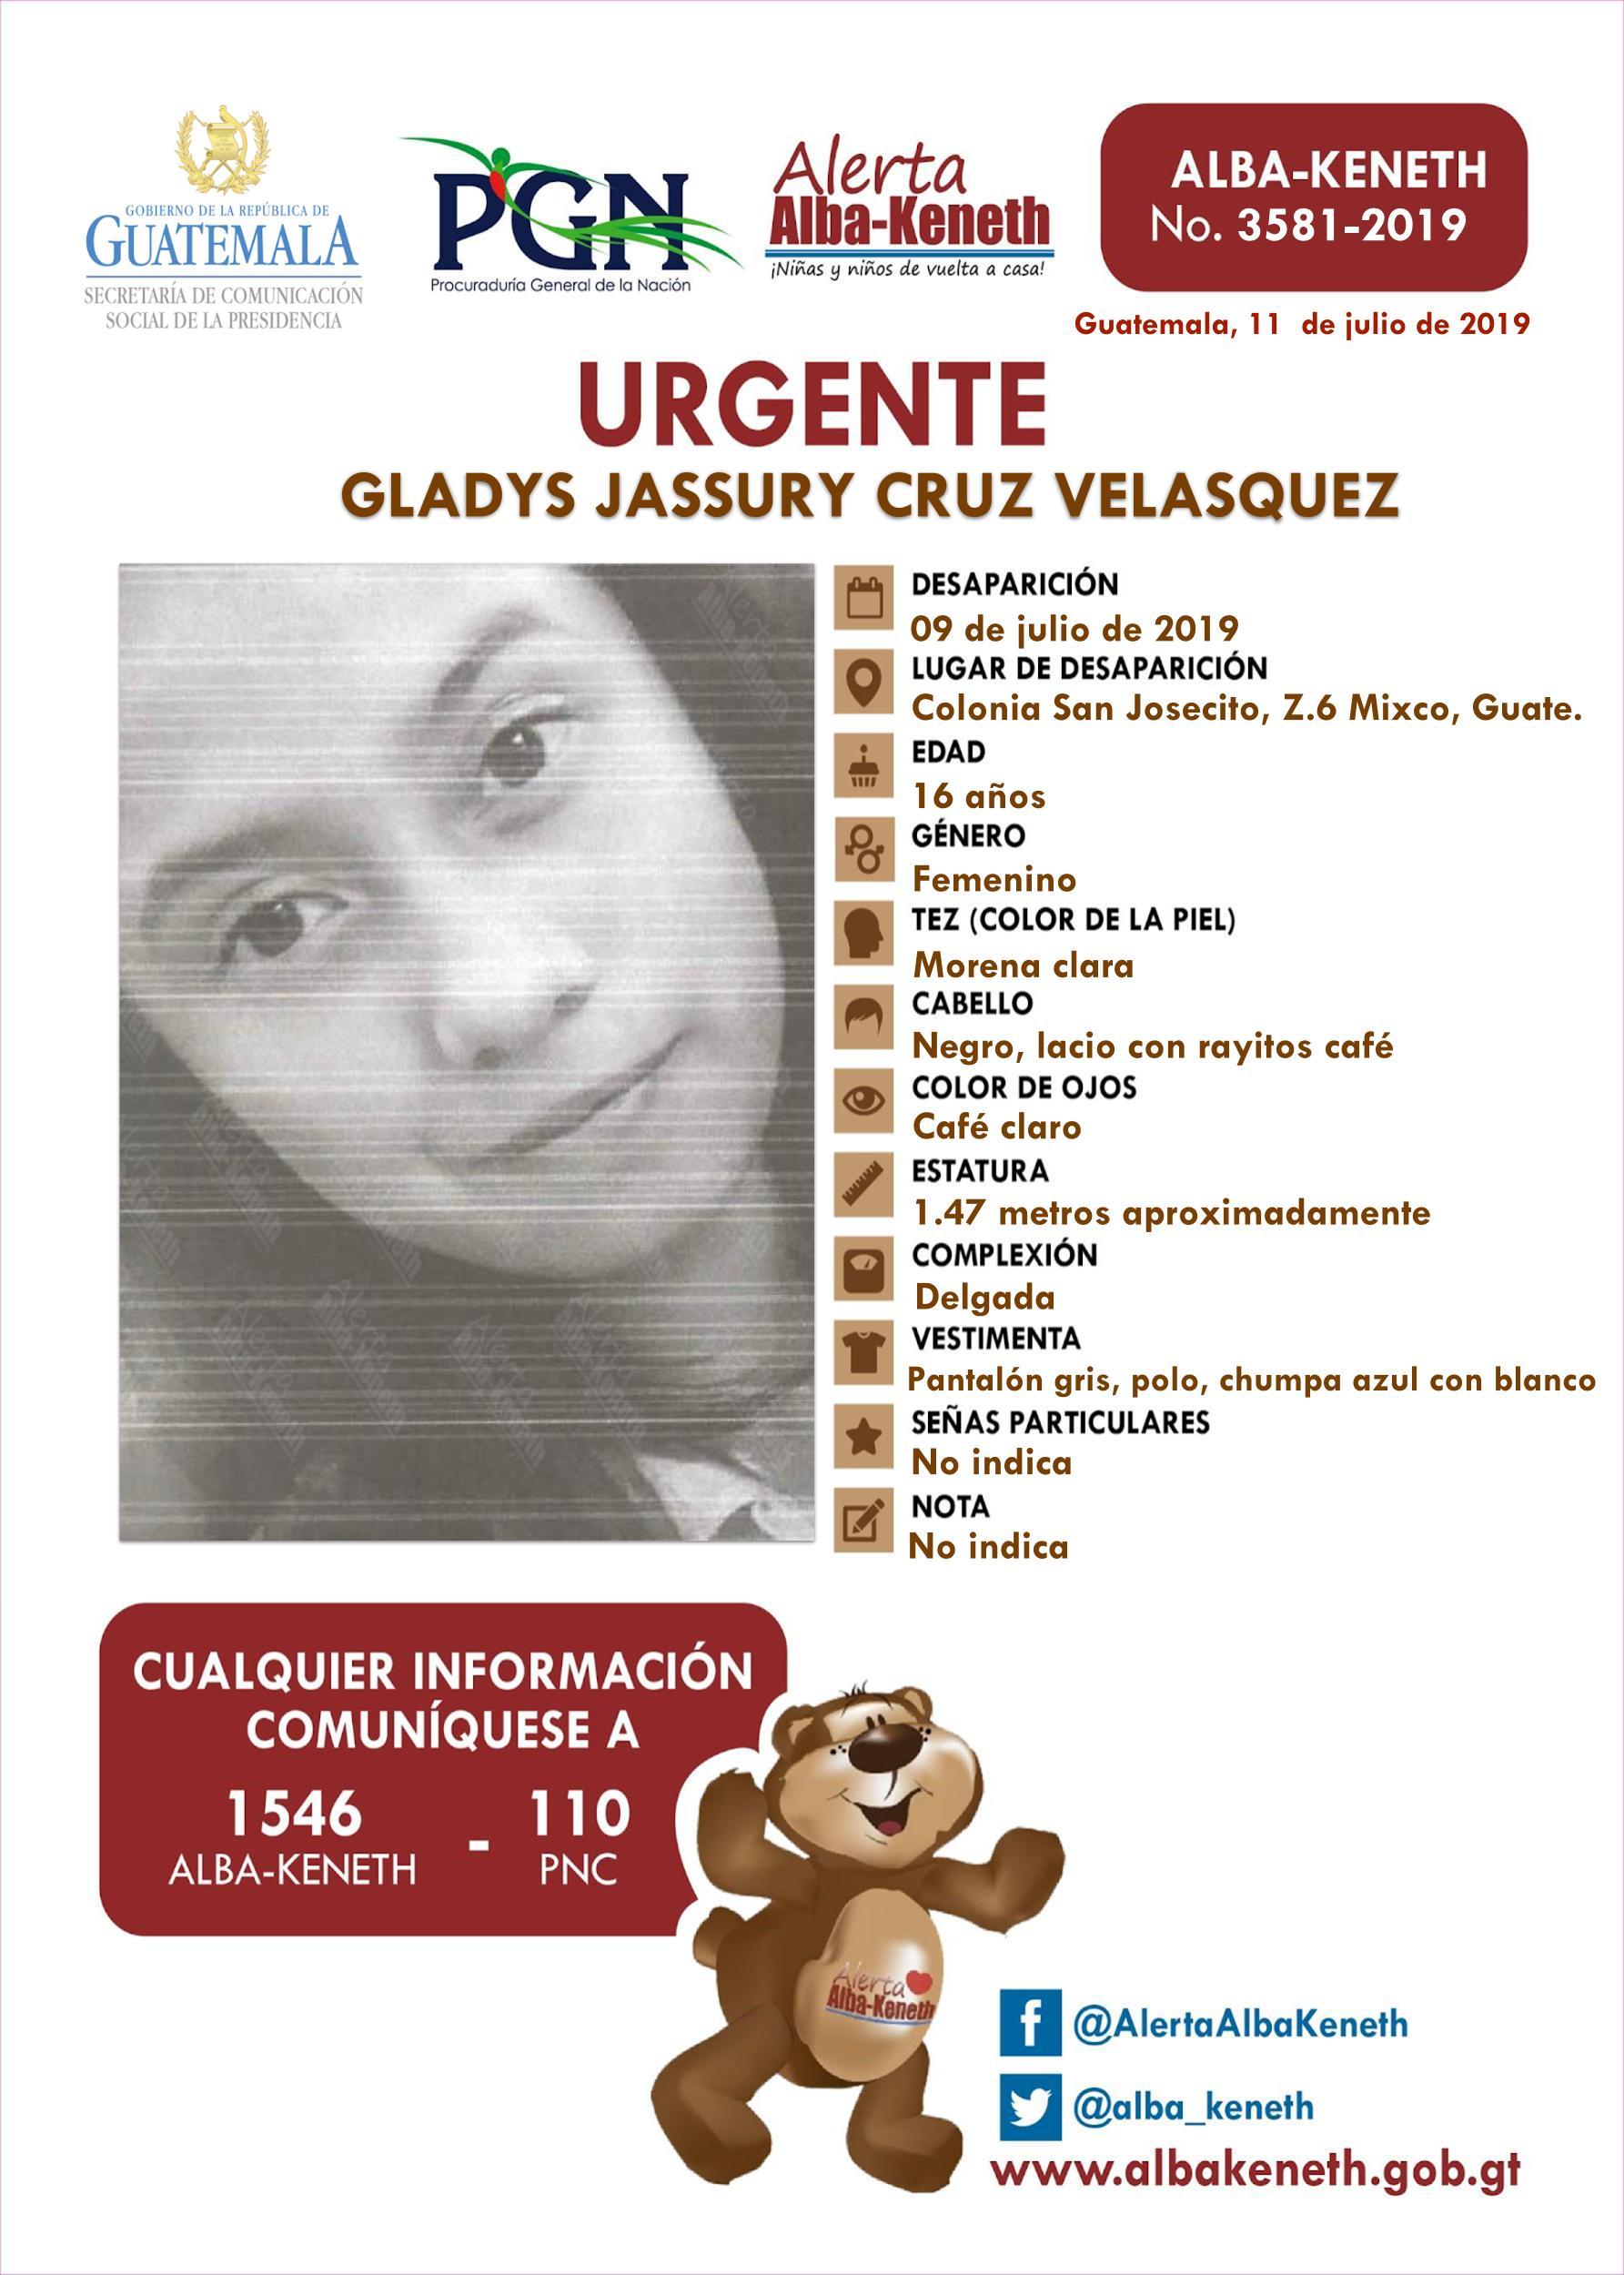 Gladys Jassury Cruz Velasquez